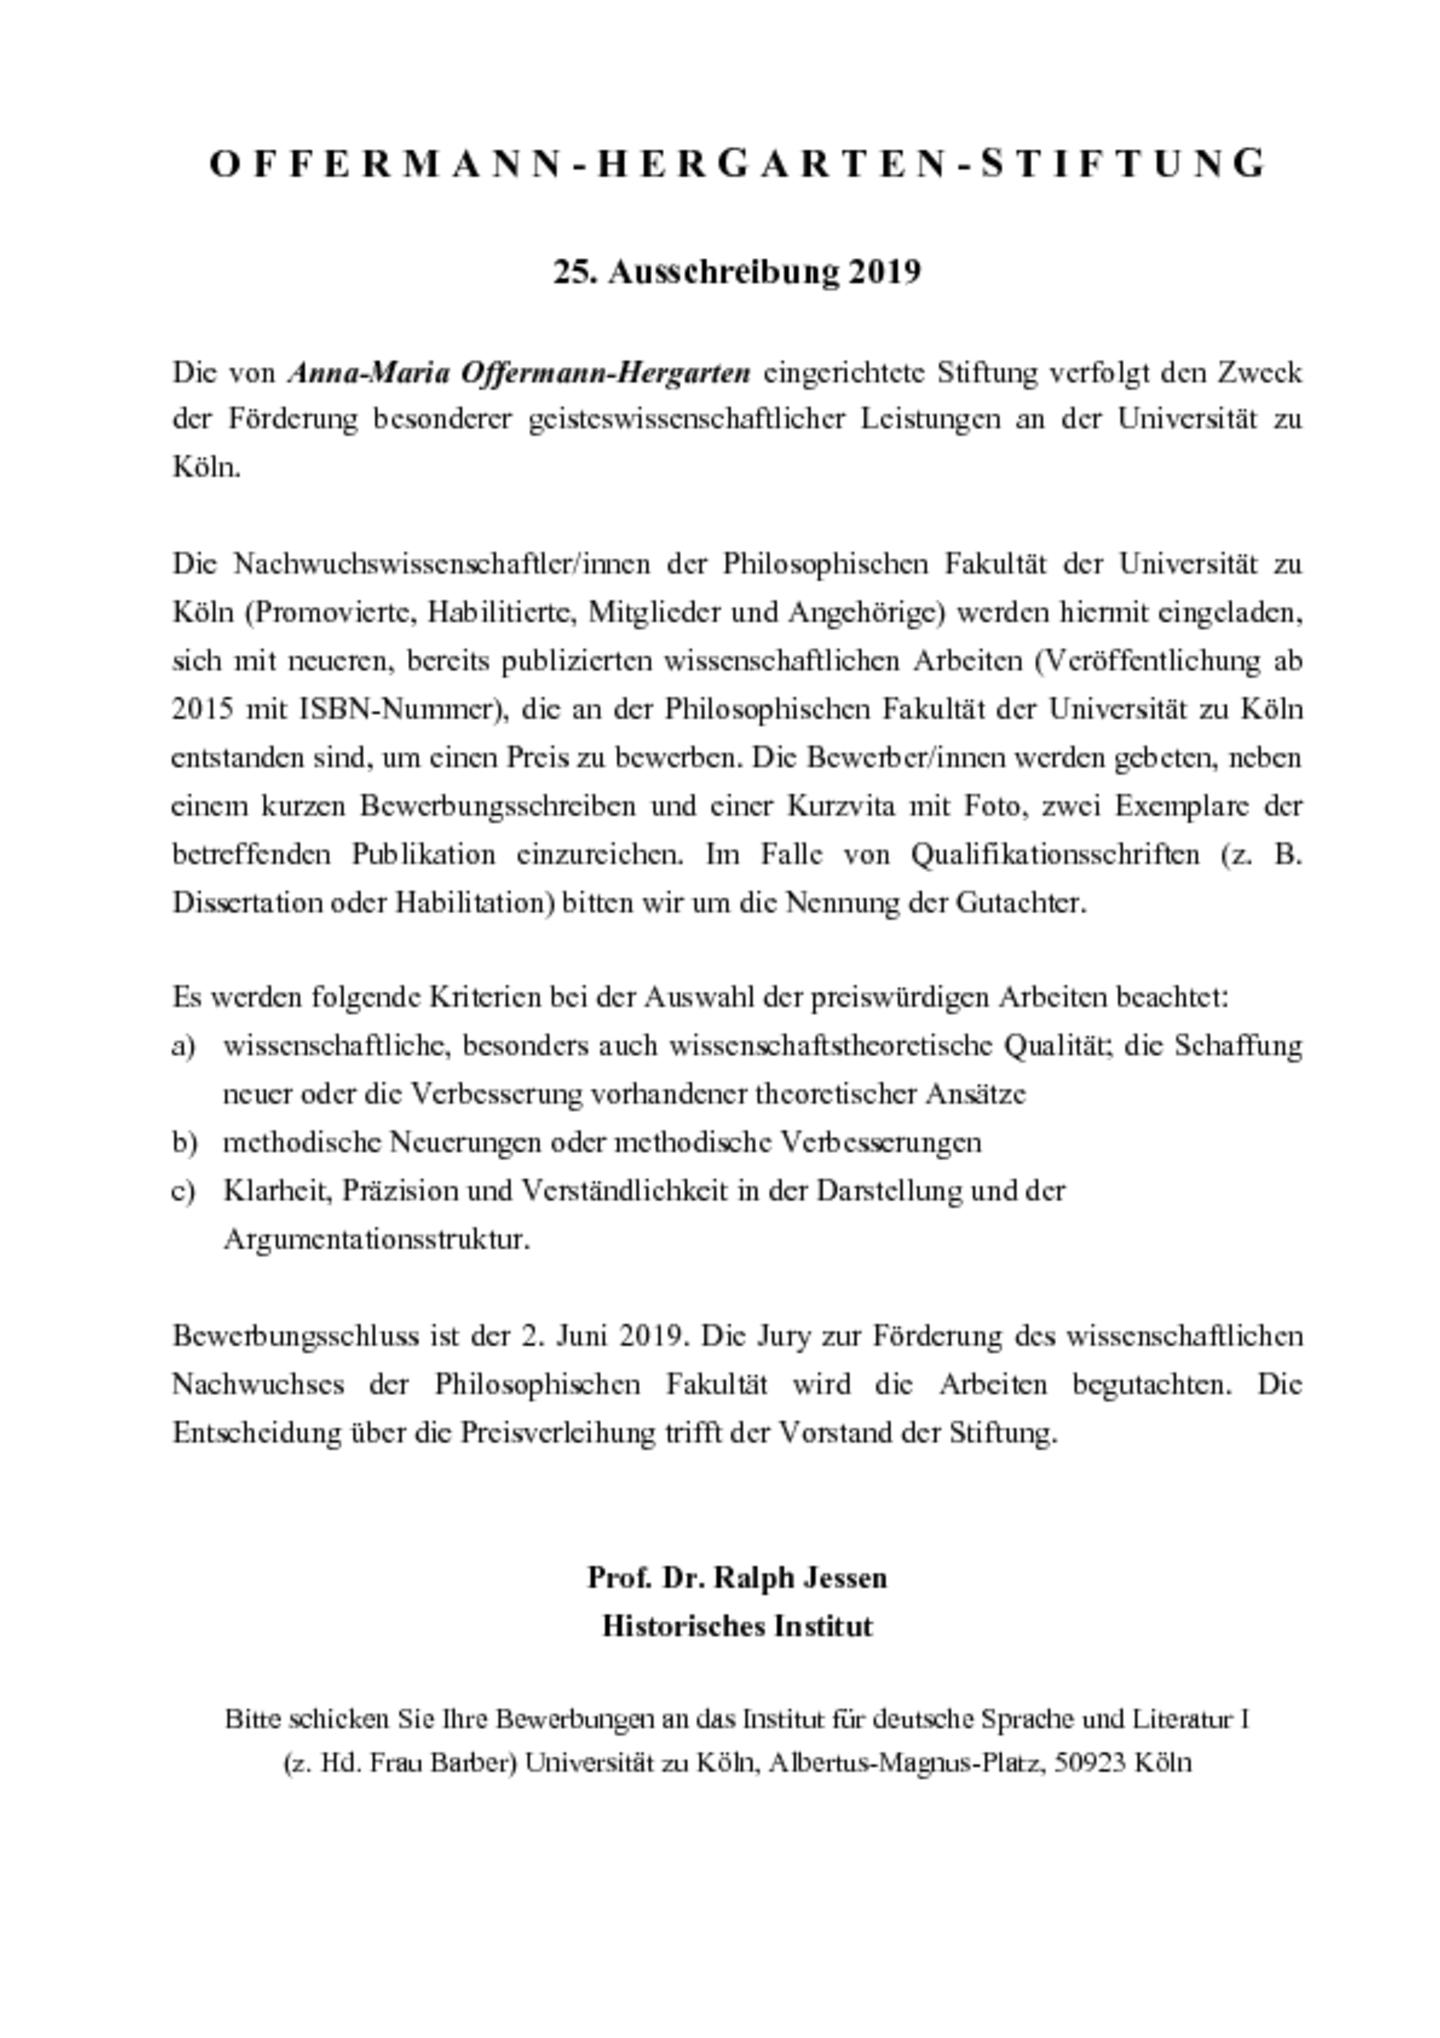 dae1d01ba0efb8 Offermann-Hergarten Prize